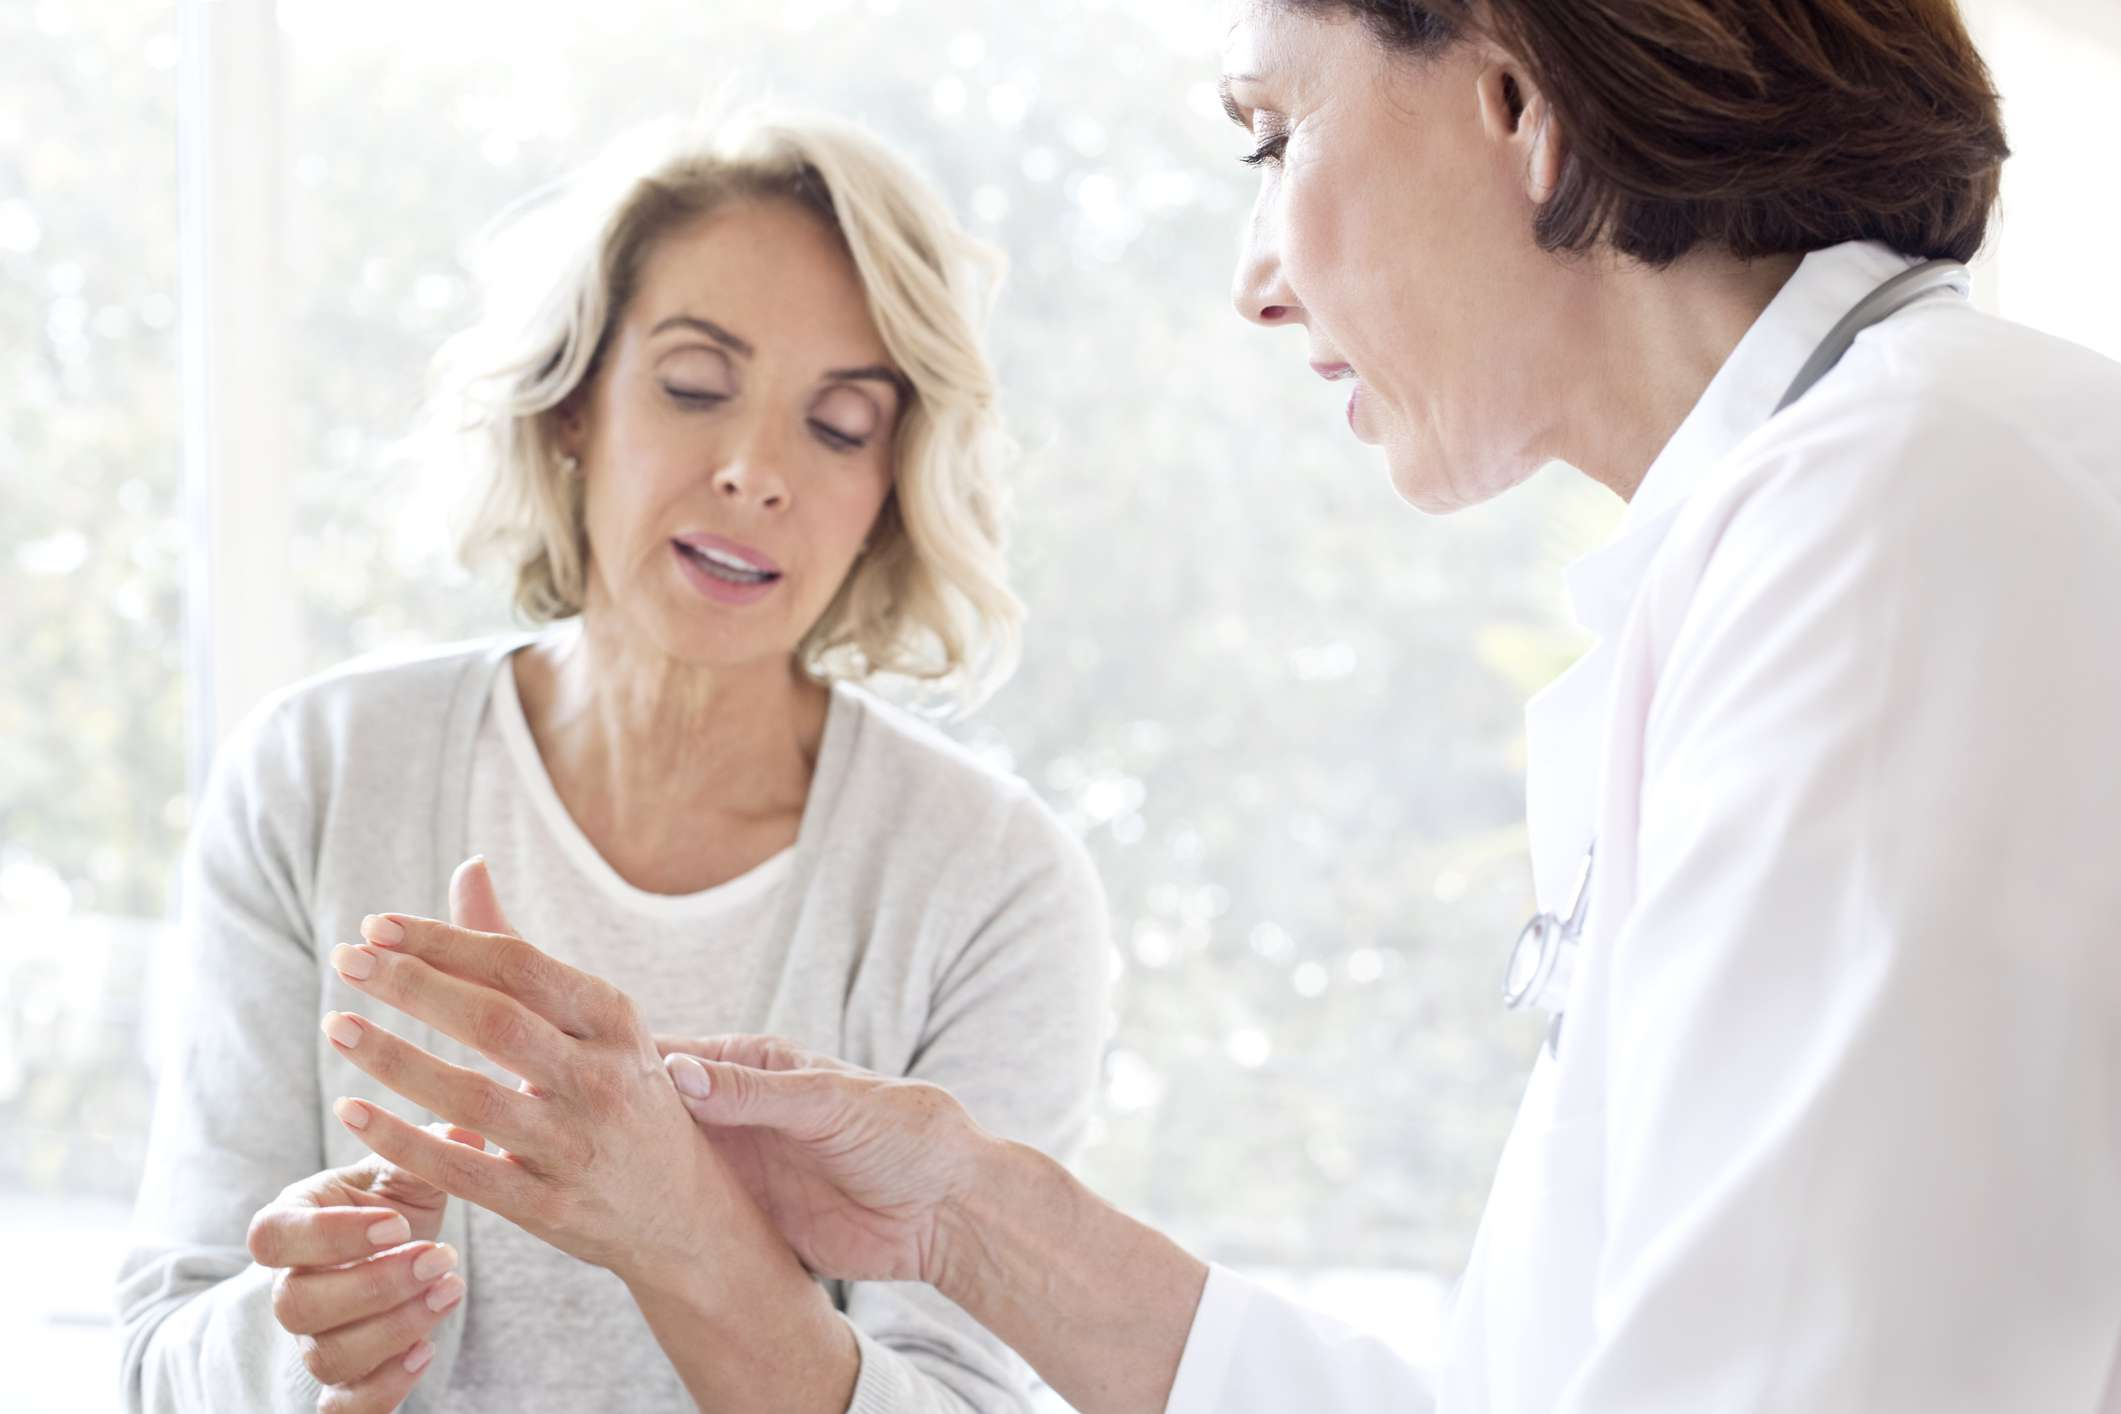 treating neuropathy